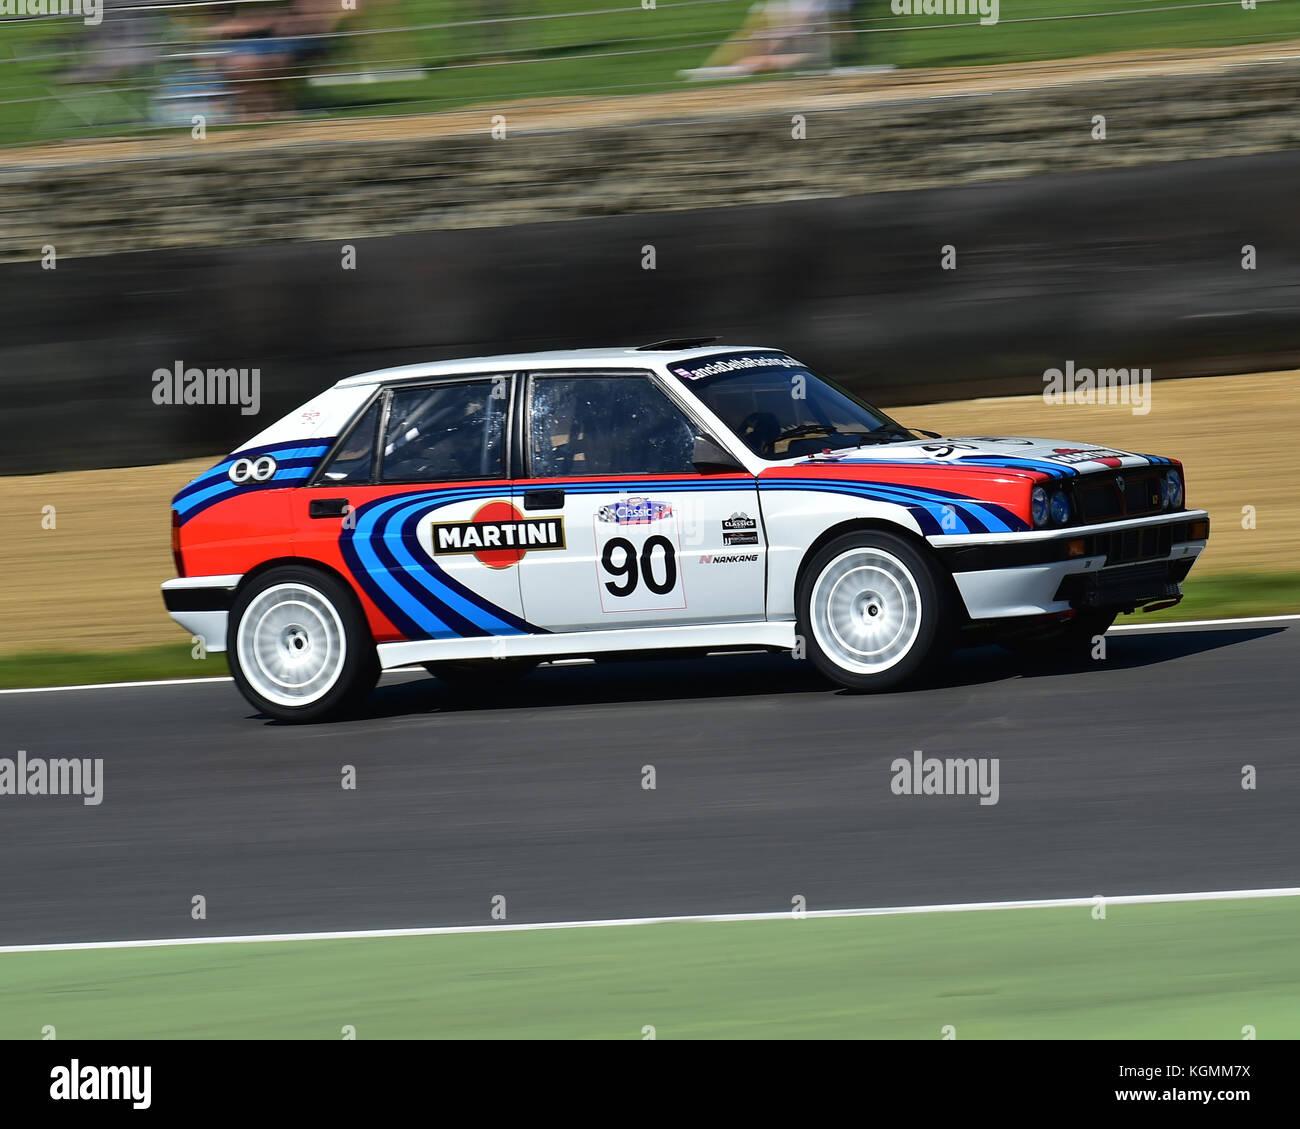 Richard Thurbin, Lancia Delta HF Integrale 16v, Italiano vs Inglese Allcomers Race, Festival Italia, Brands Hatch, - Stock Image